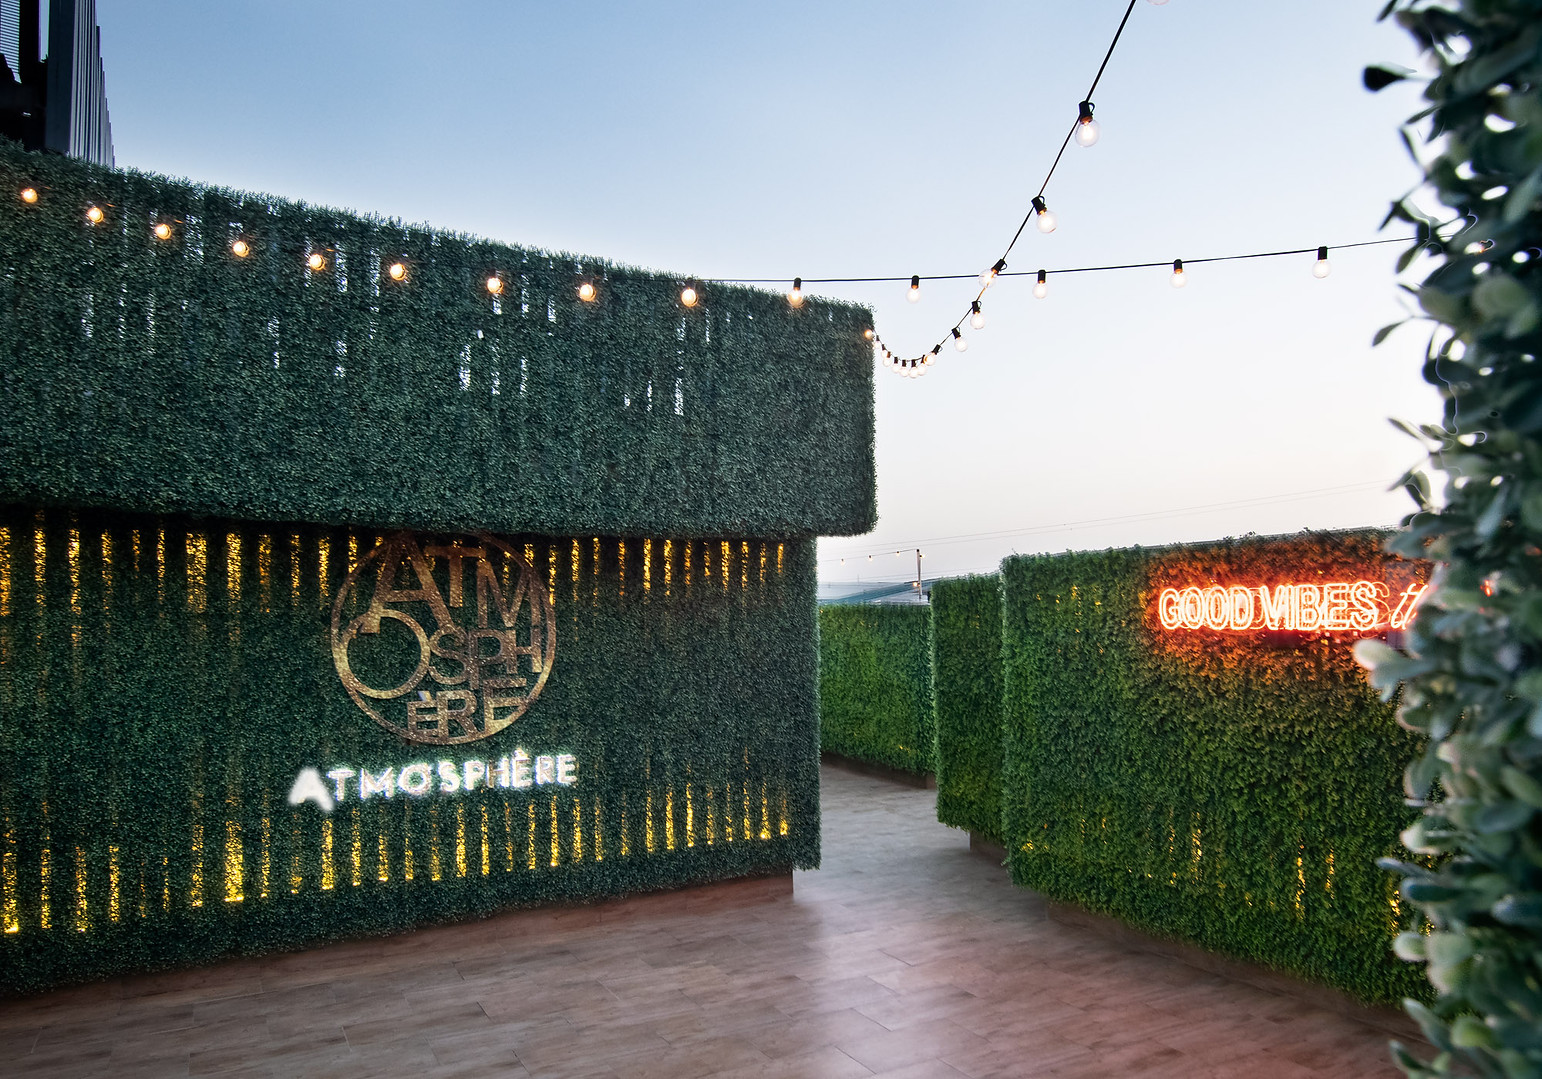 DCC_Atmosphere Rooftop Restaurant_31.jpg